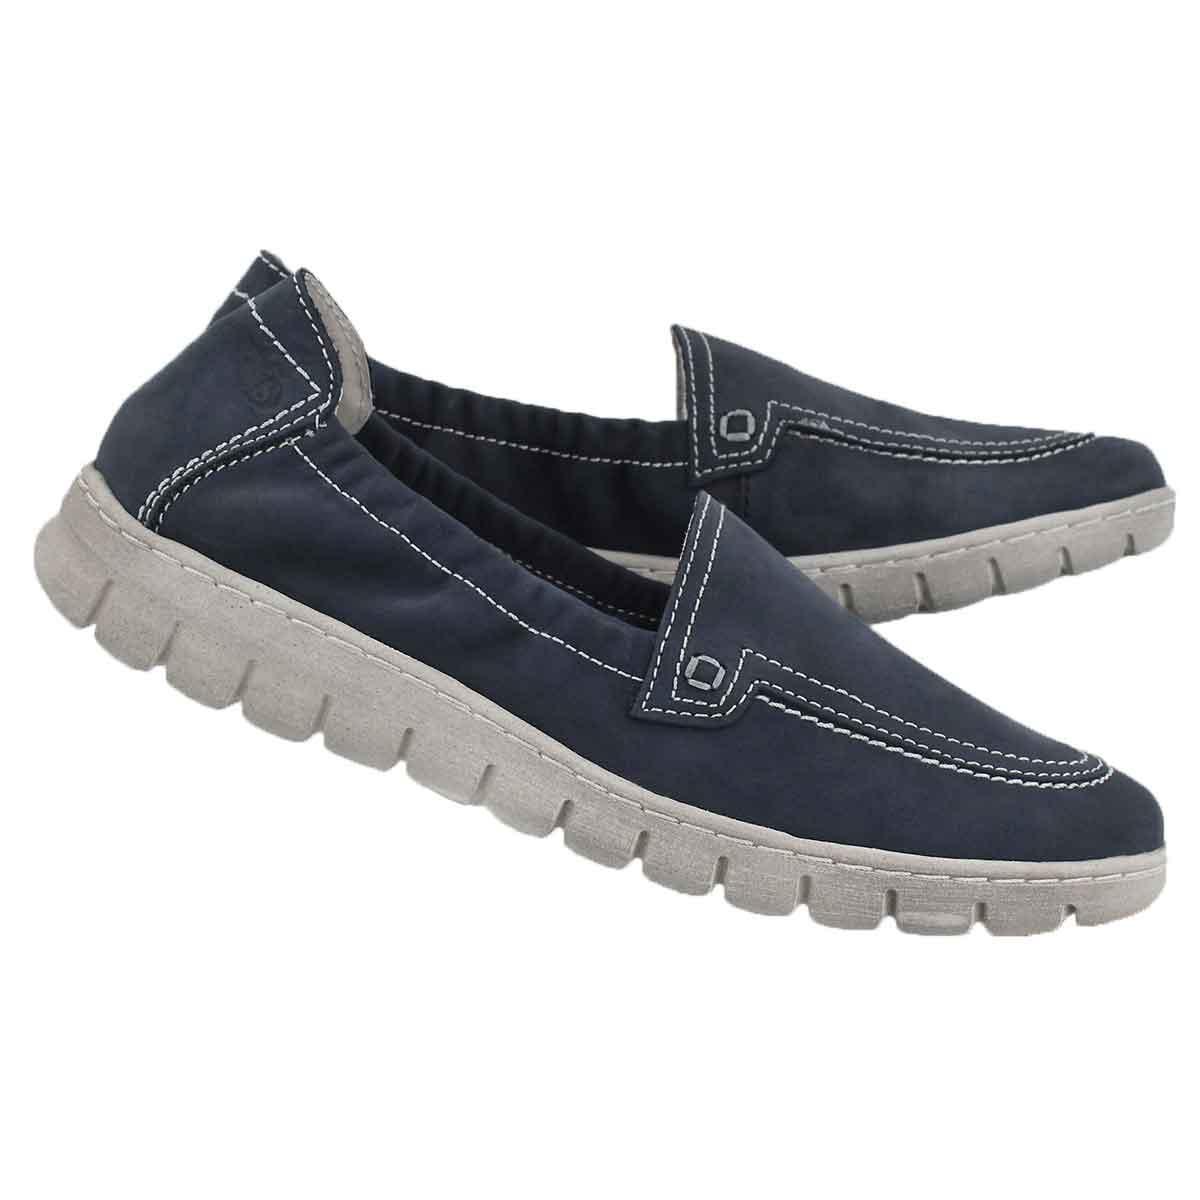 Lds Steffi 57 ocean slip on shoe